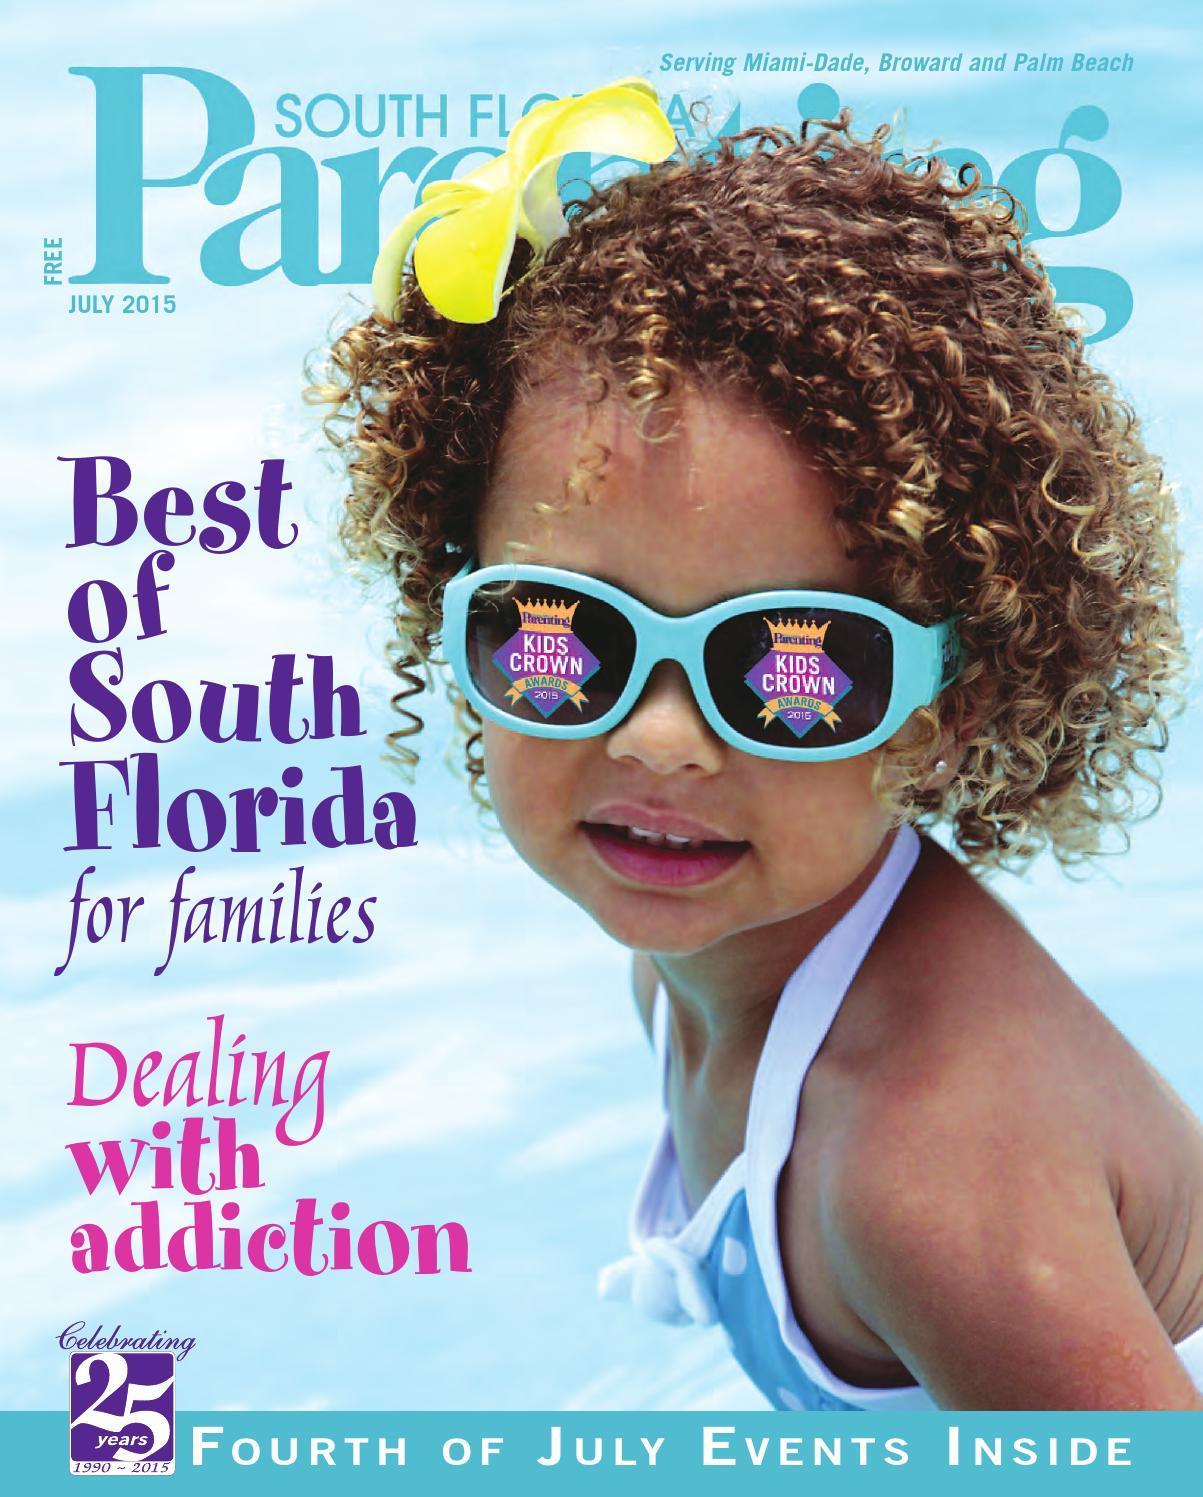 cdb208b96f93 South Florida Parenting by Forum Publishing Group - issuu